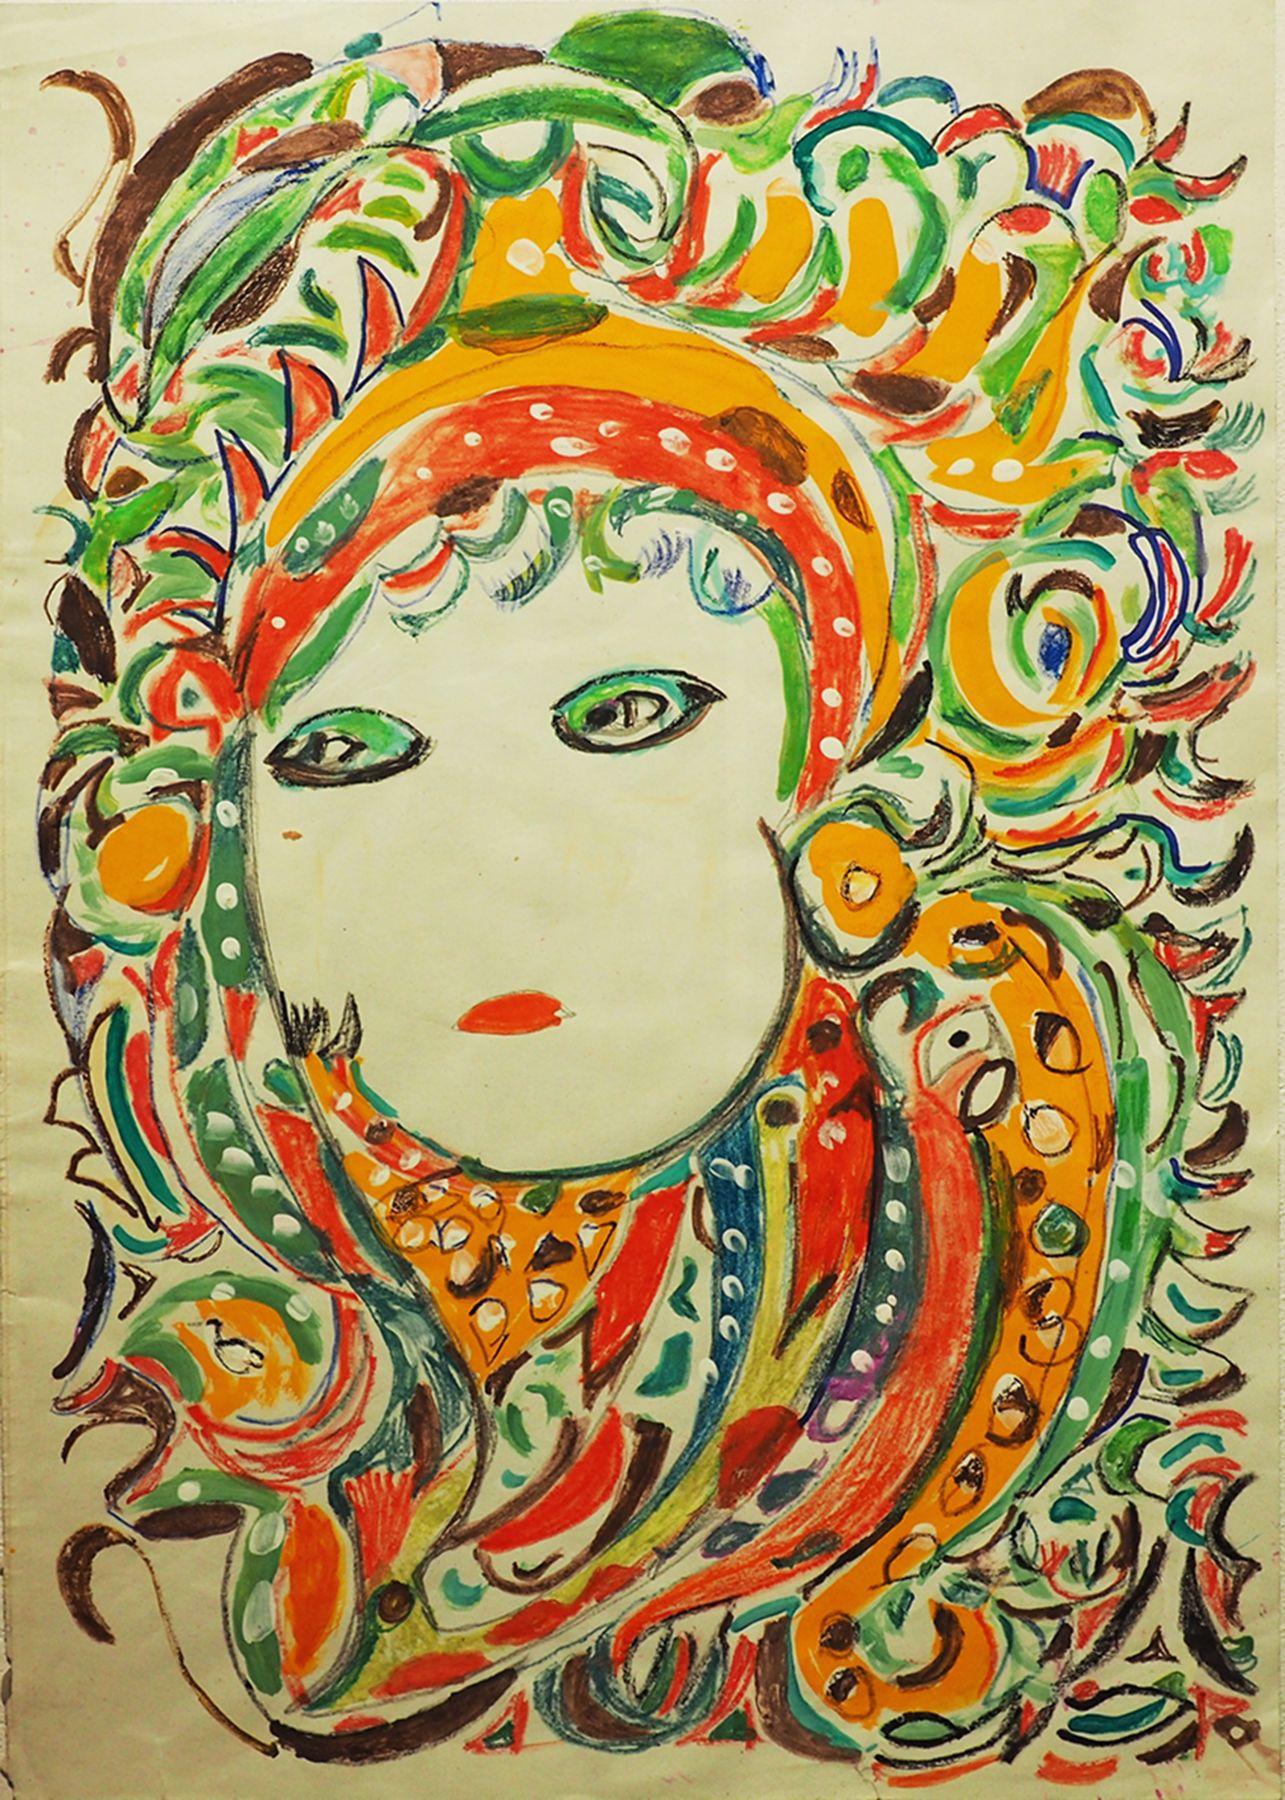 Martha Grunenwaldt(1910-2008) Belgium, Untitled, n.d., Mixed media on paper, 16.5 x 12 in